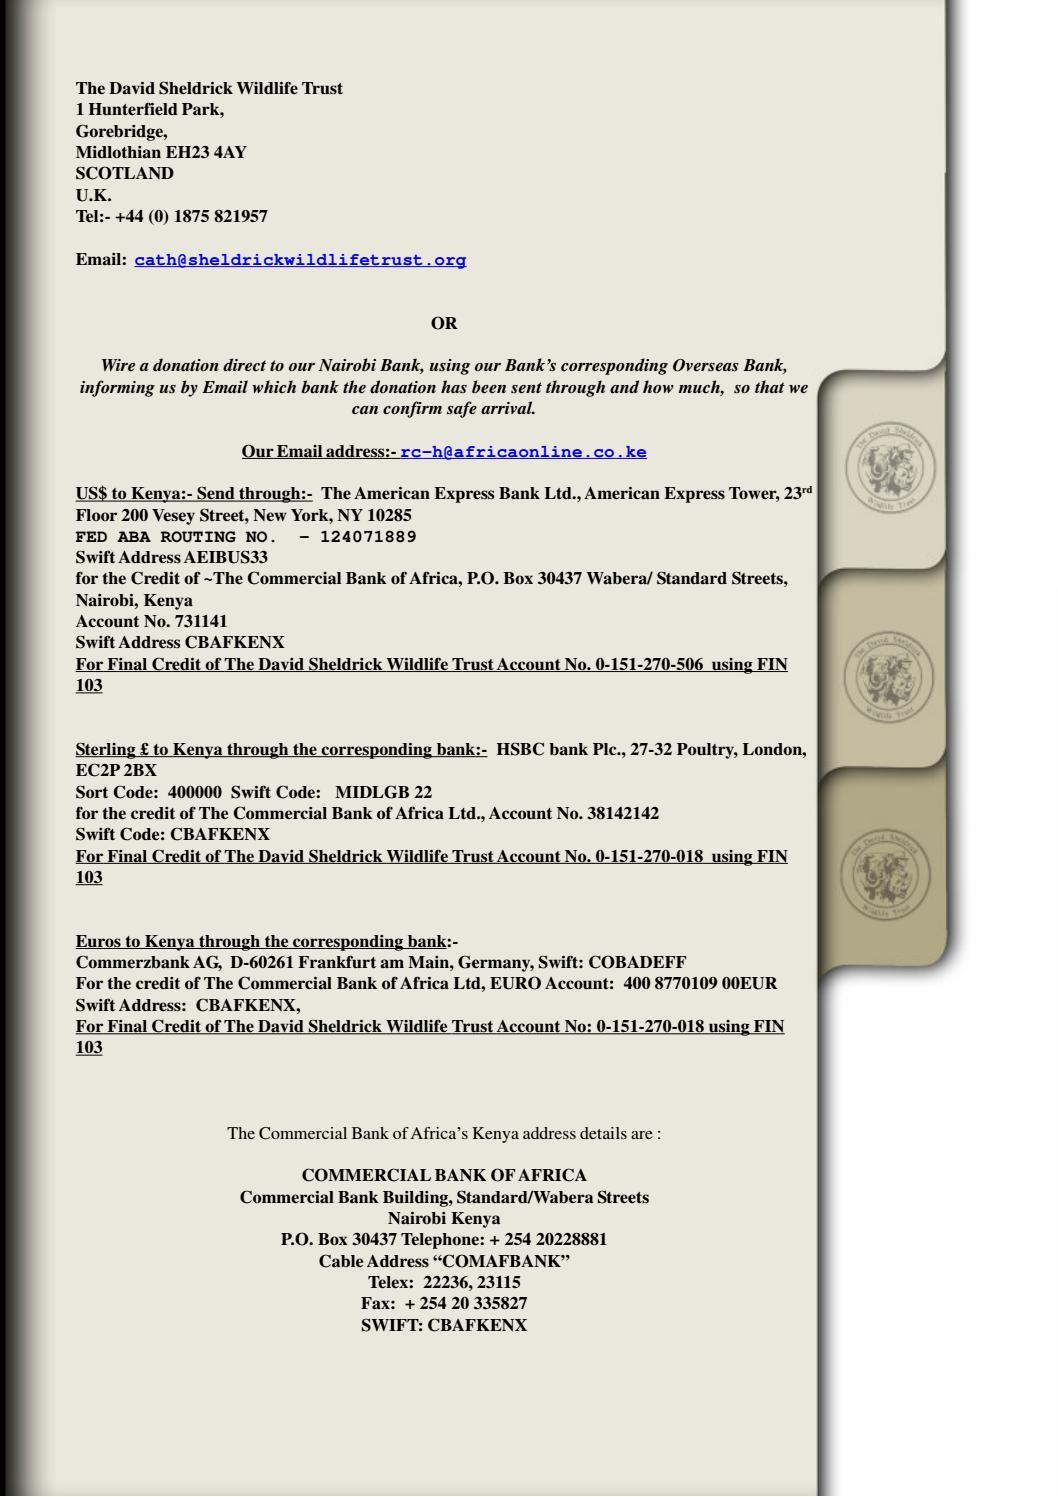 DSWT Annual Newsletter 2004 by Sheldrick Wildlife Trust - issuu